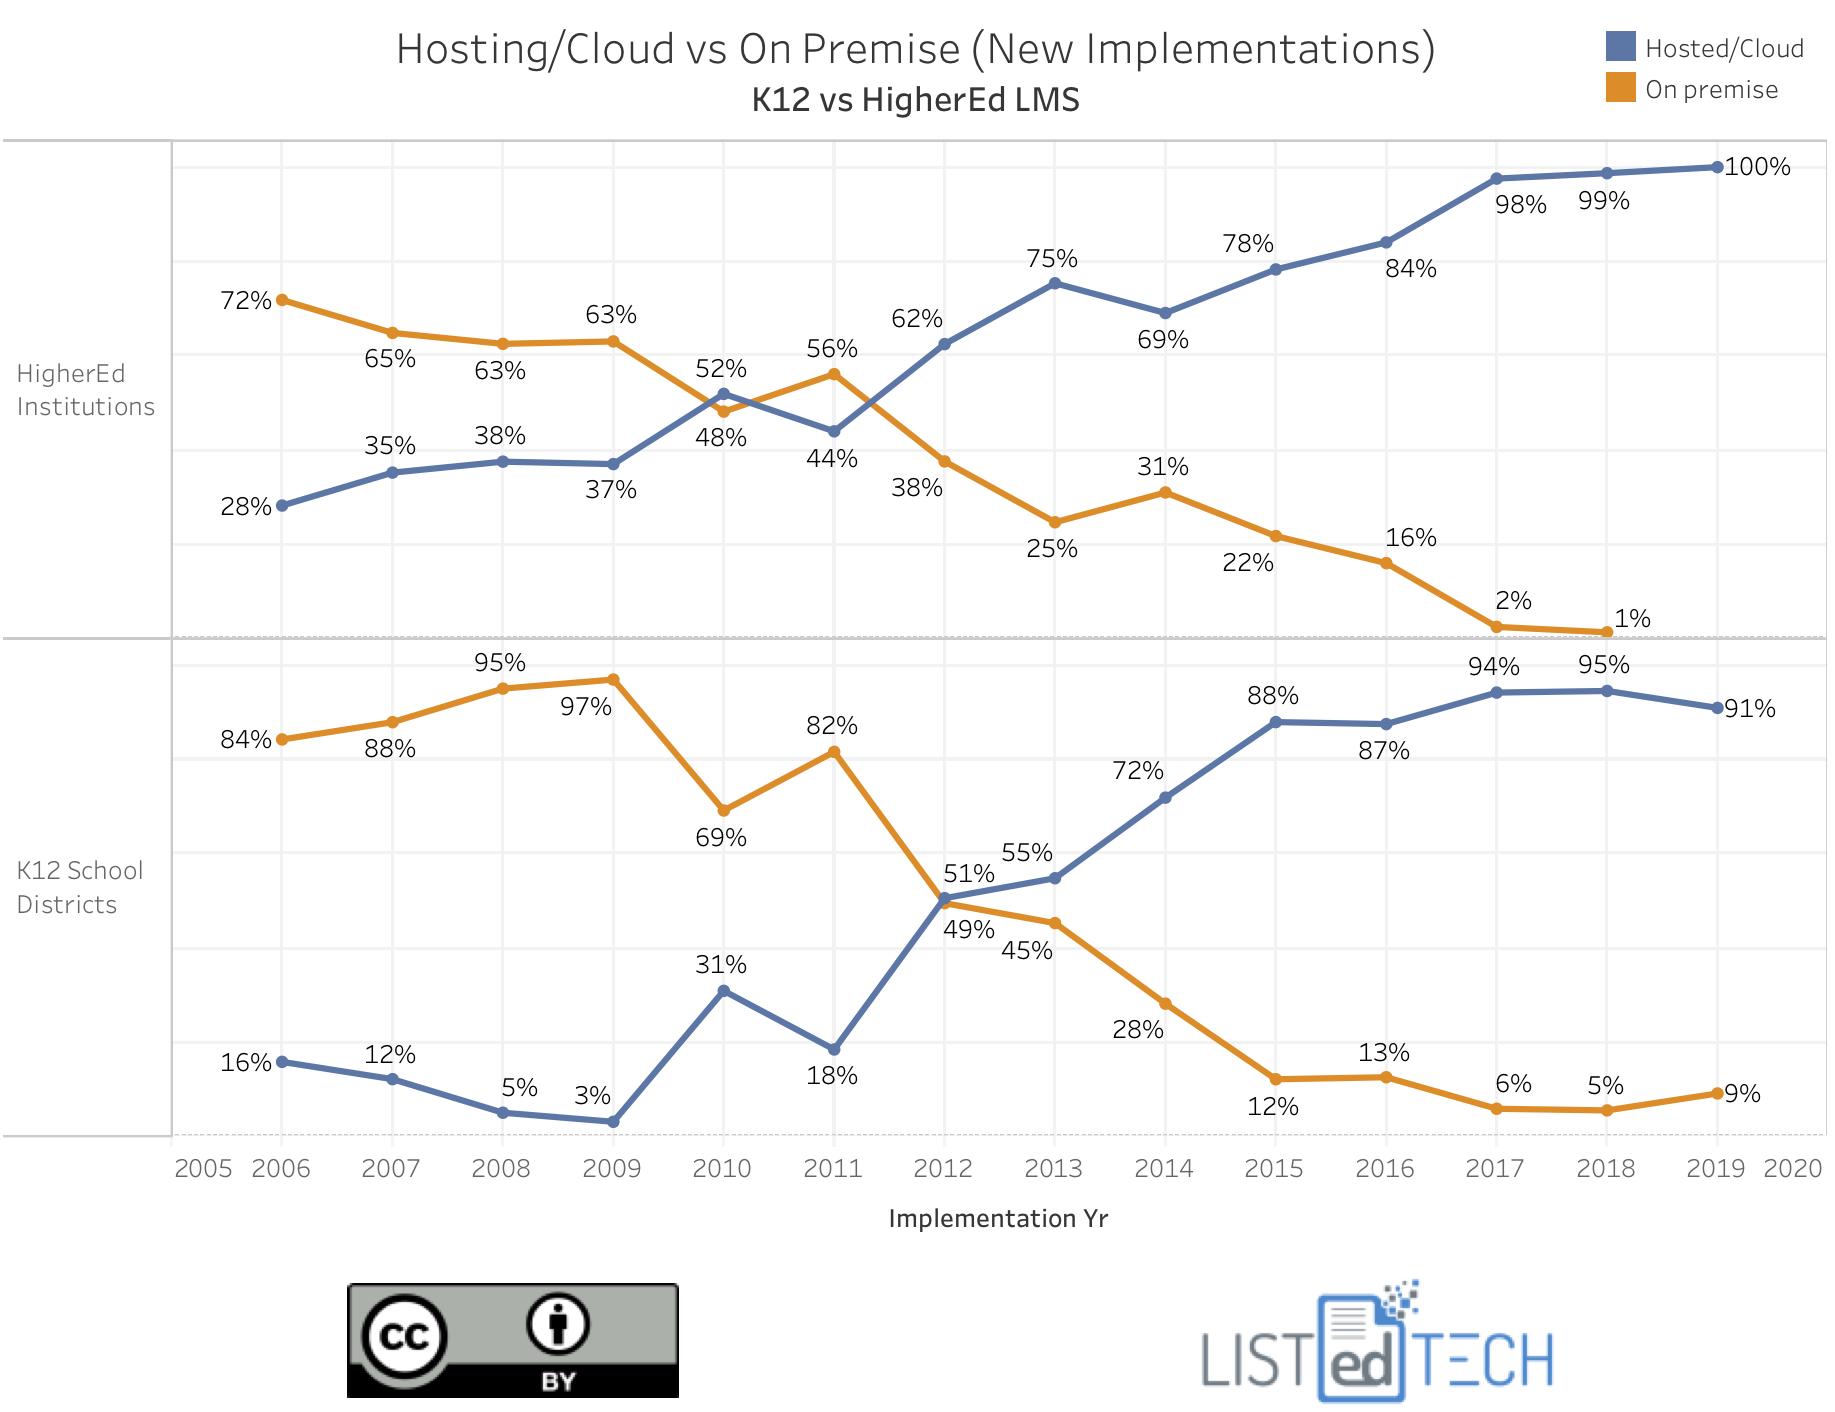 K12 vs HigherEd LMS Hosting v2.png